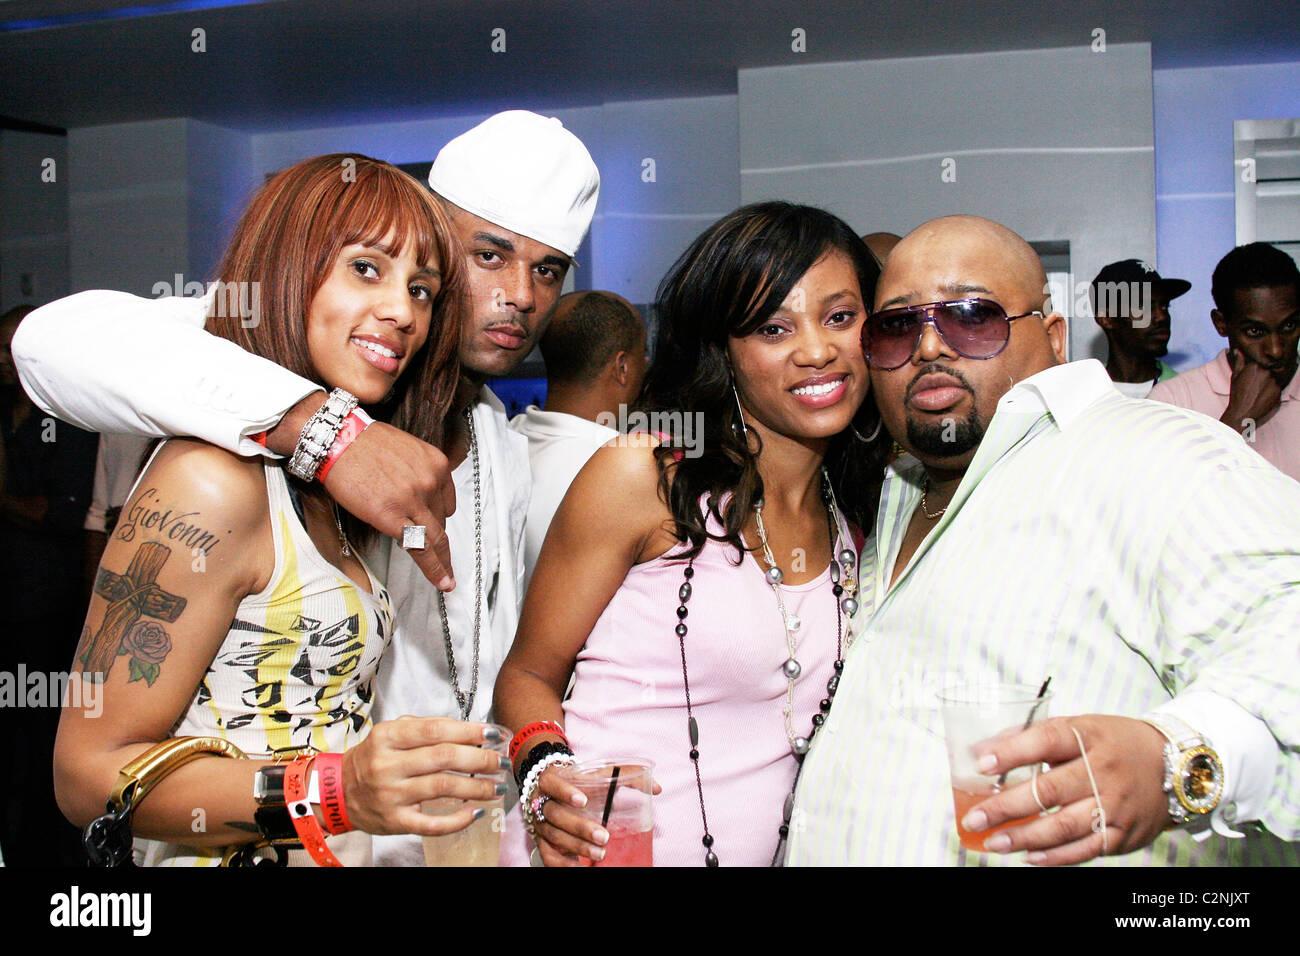 Jazze Pha Bu S Akon S Brother 2nd Annual Birthday Celebration At Compound Club Atlanta Georgia 24 04 08 Stock Photo Alamy